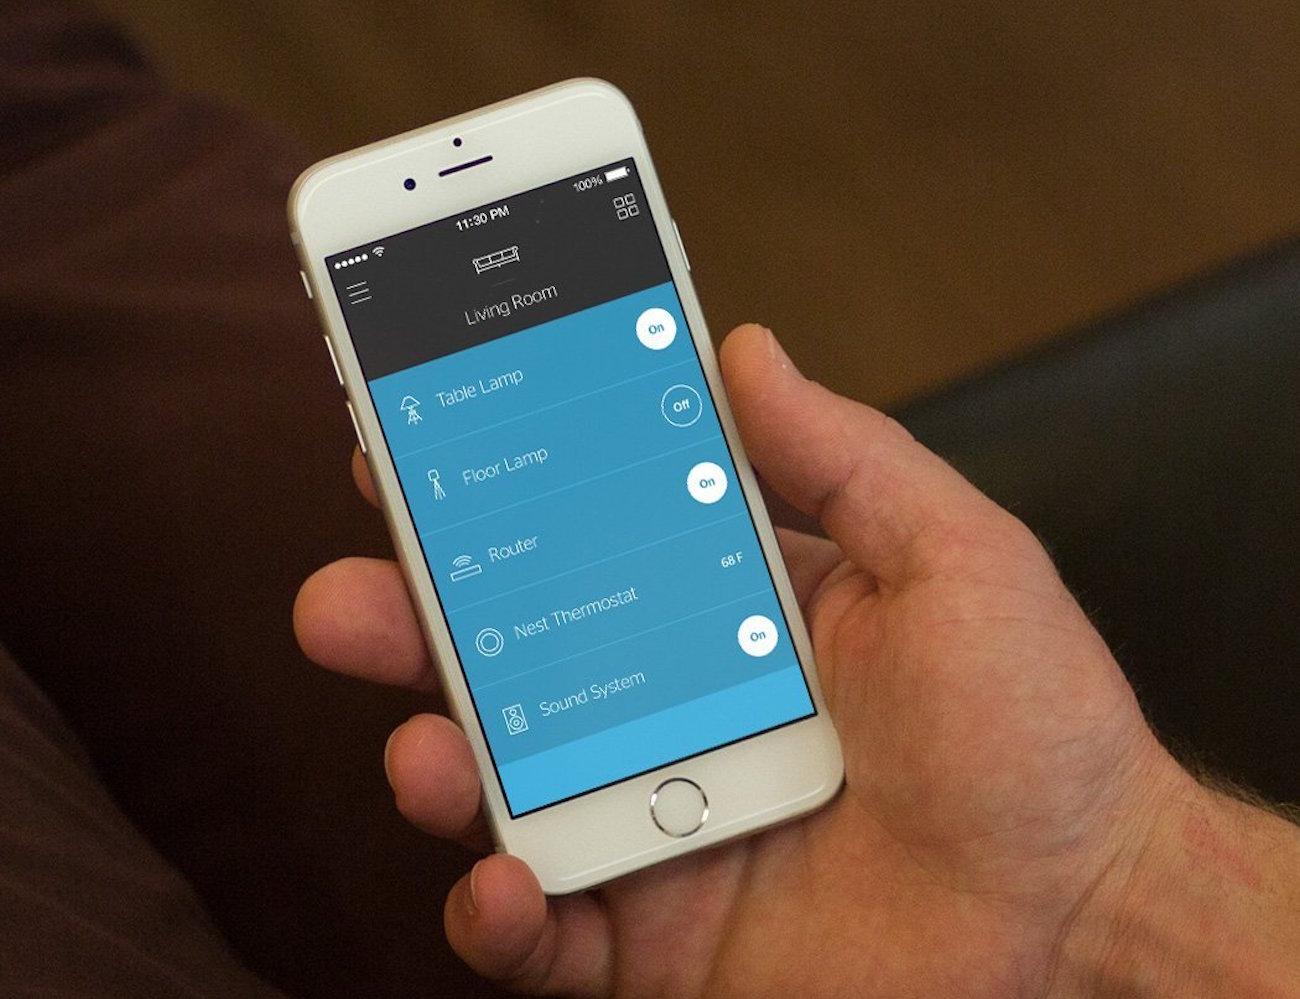 Zuli Smartplug – Smart Outlet Plug for Home Control